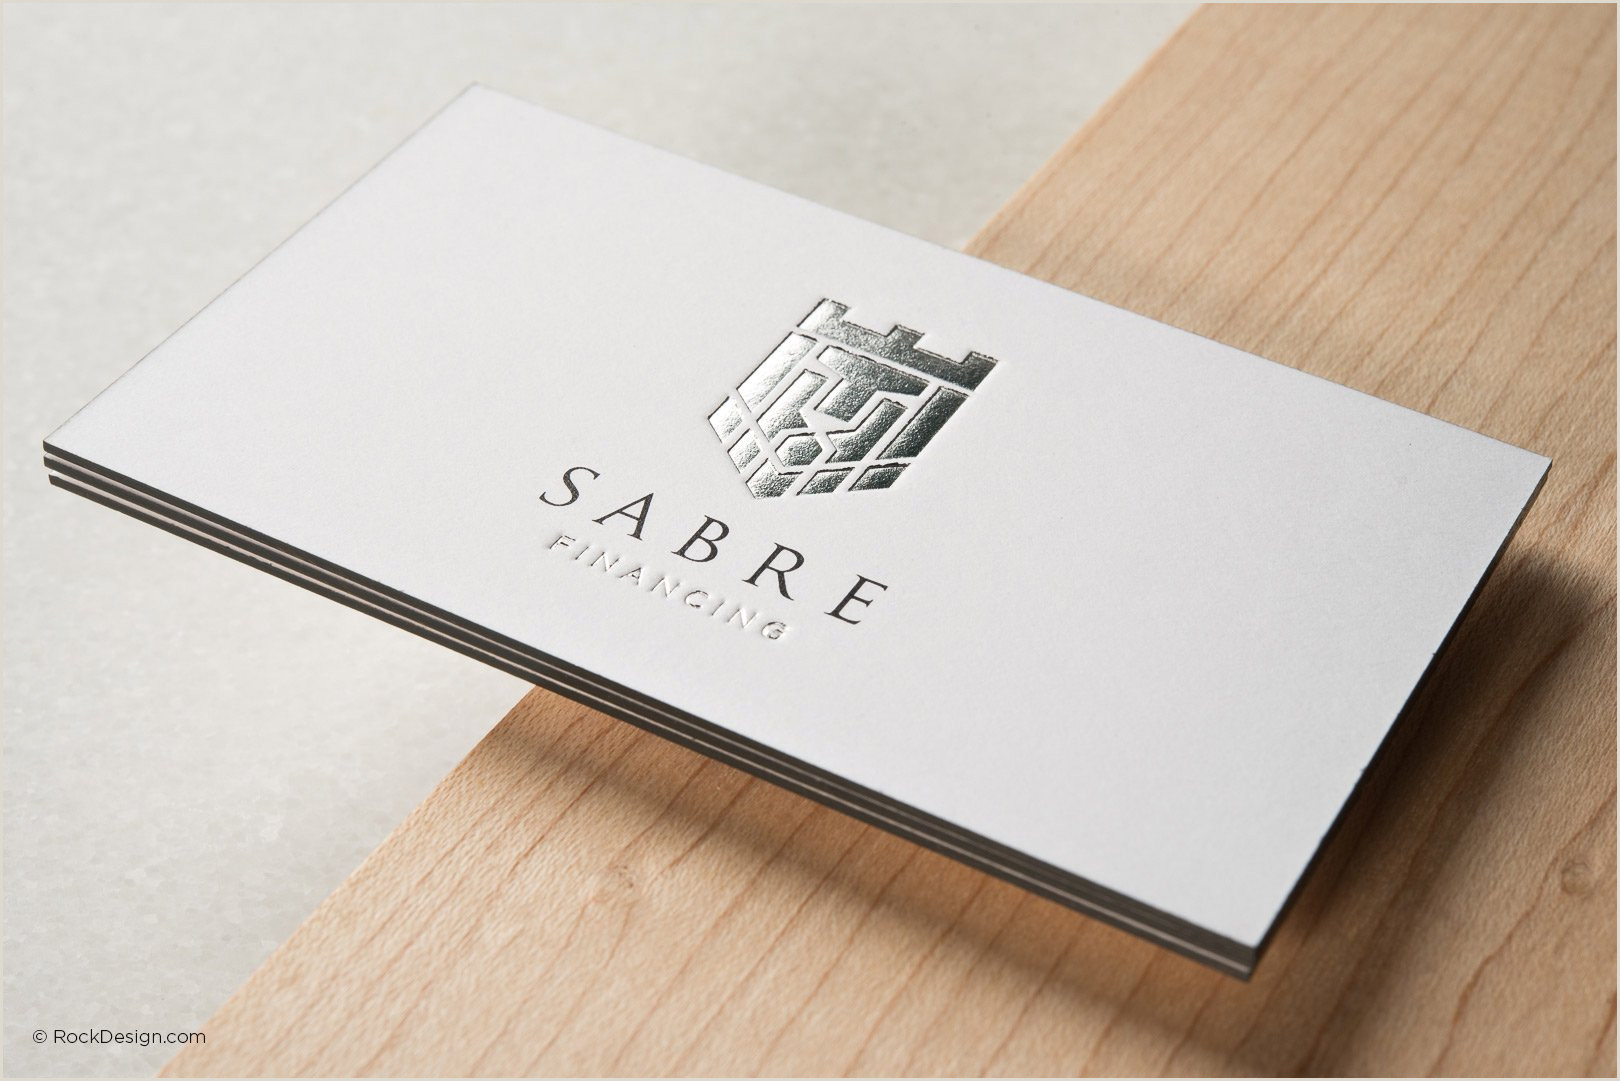 Business Card Back Design Free Emboss & Foil Business Card Templates